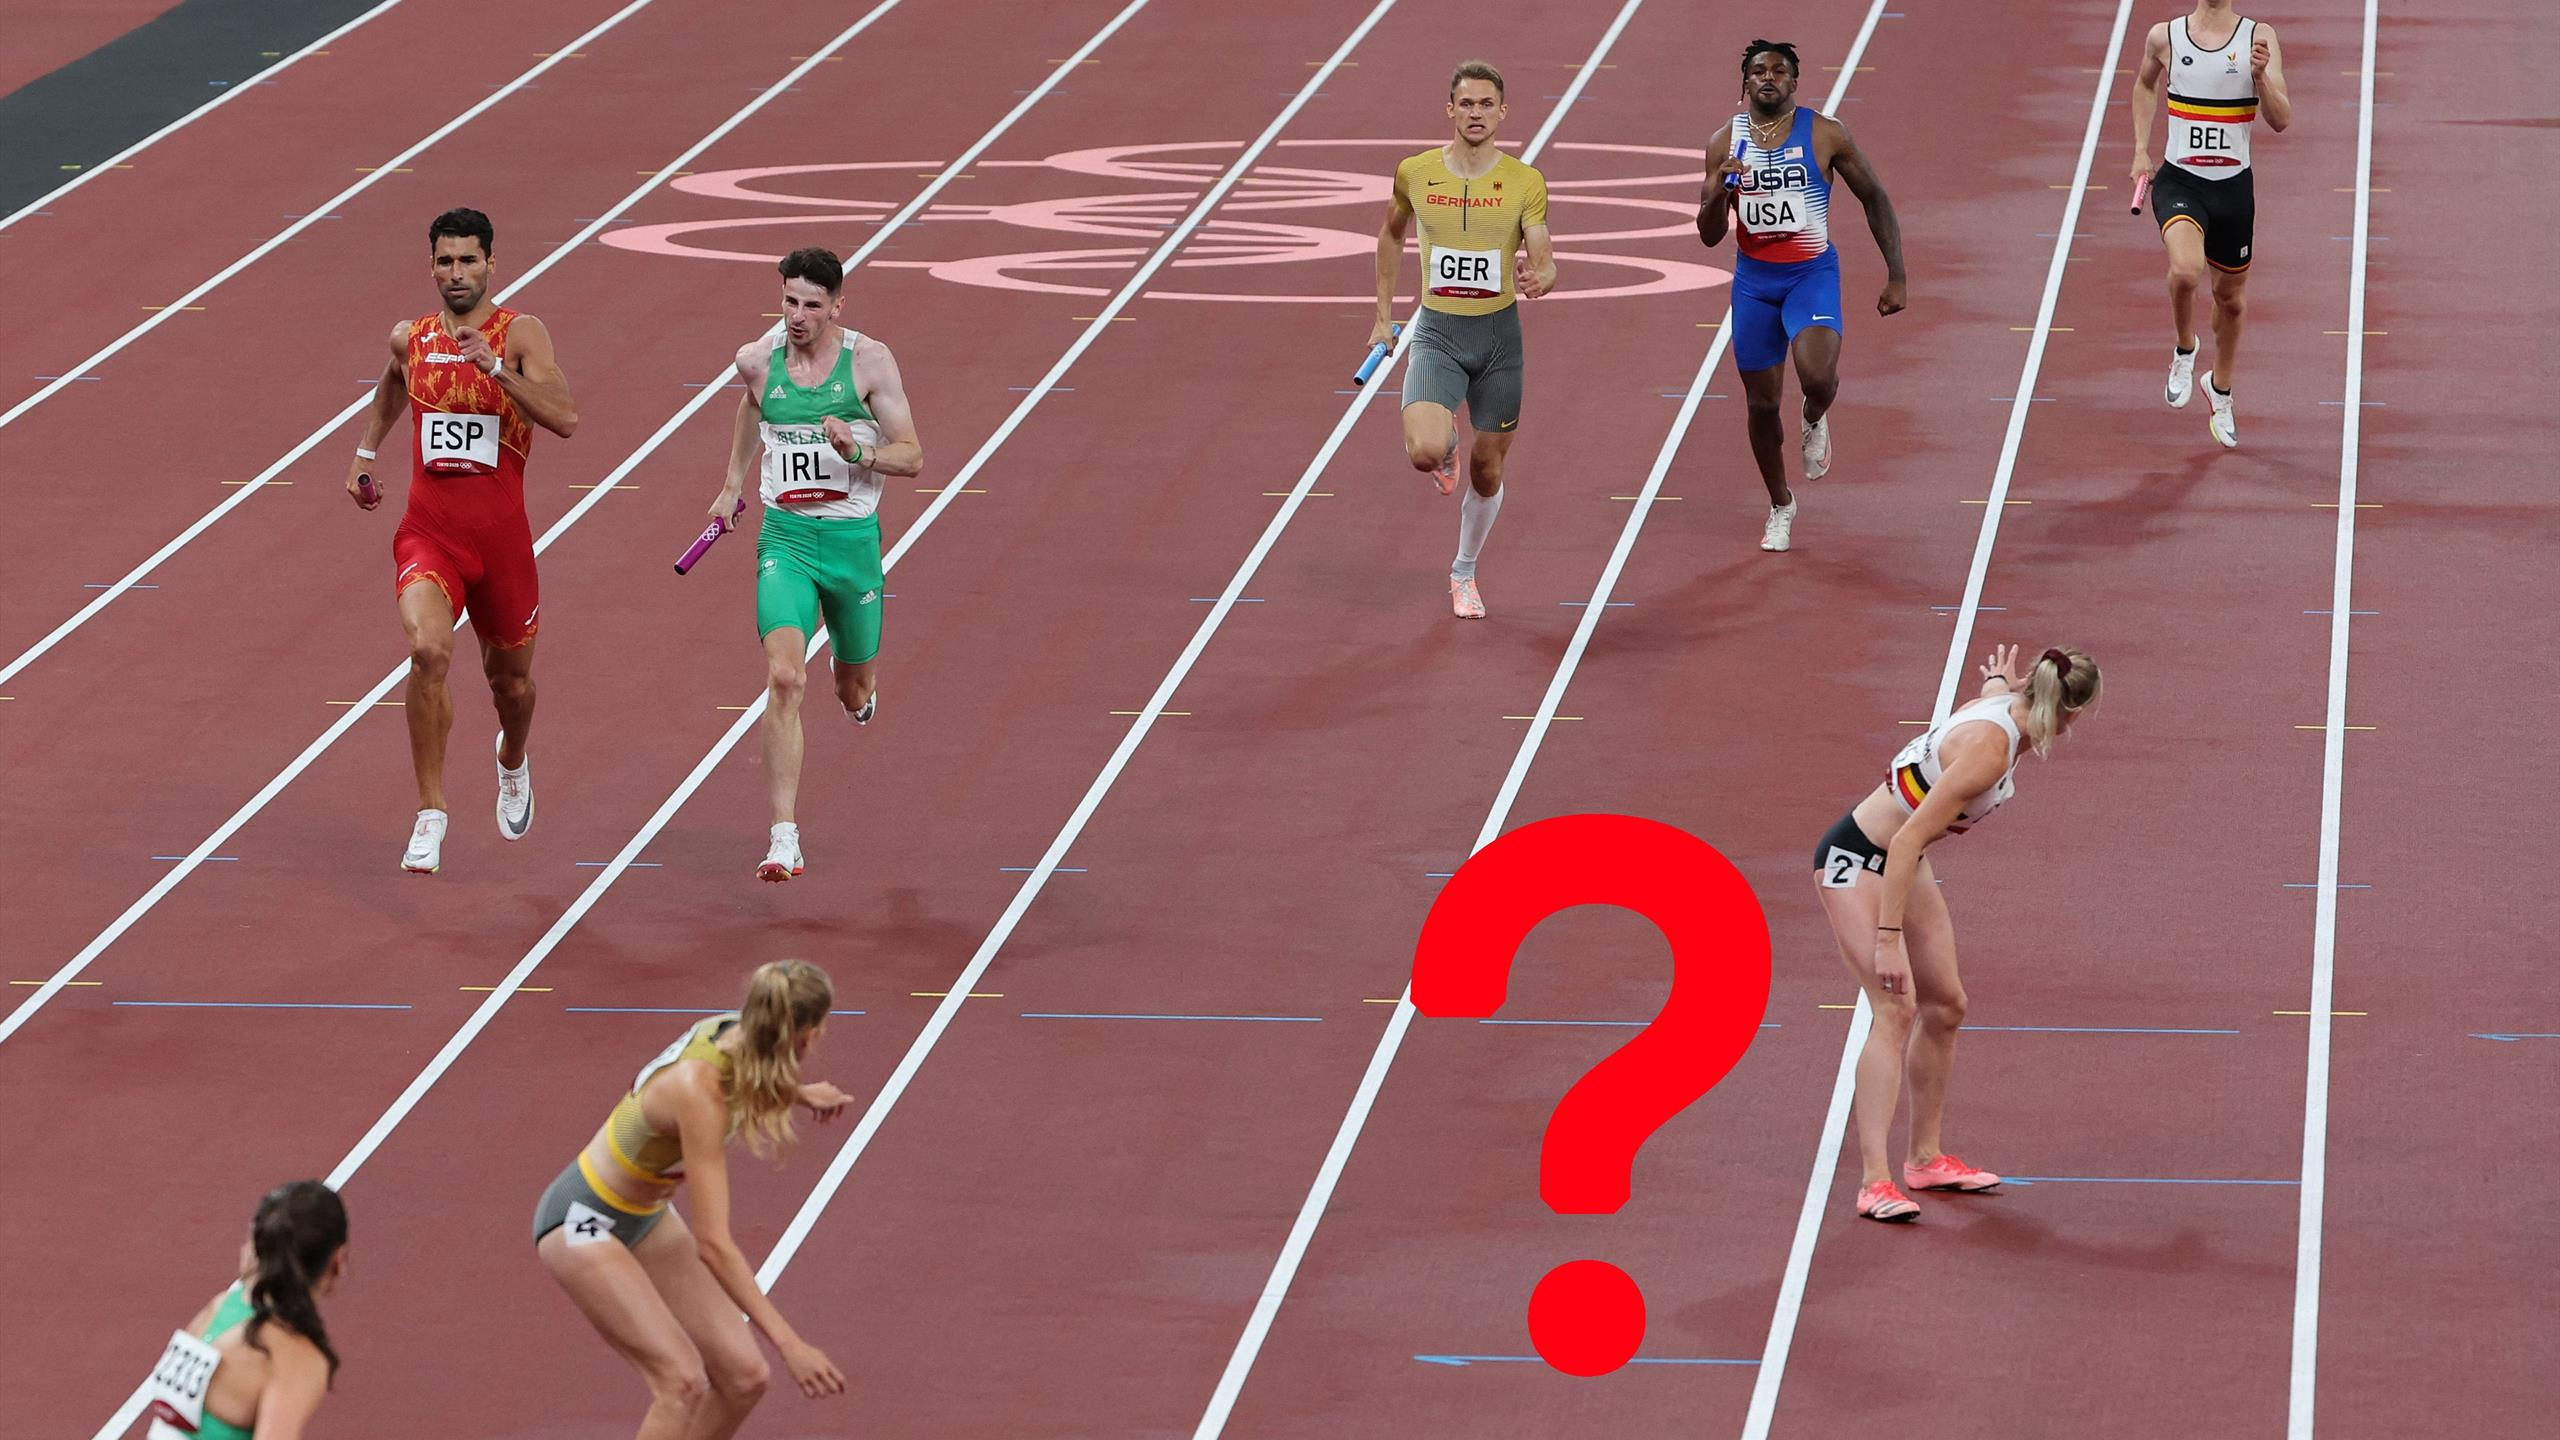 Momen membingungkan dalam estafet gaya ganti 4x400m